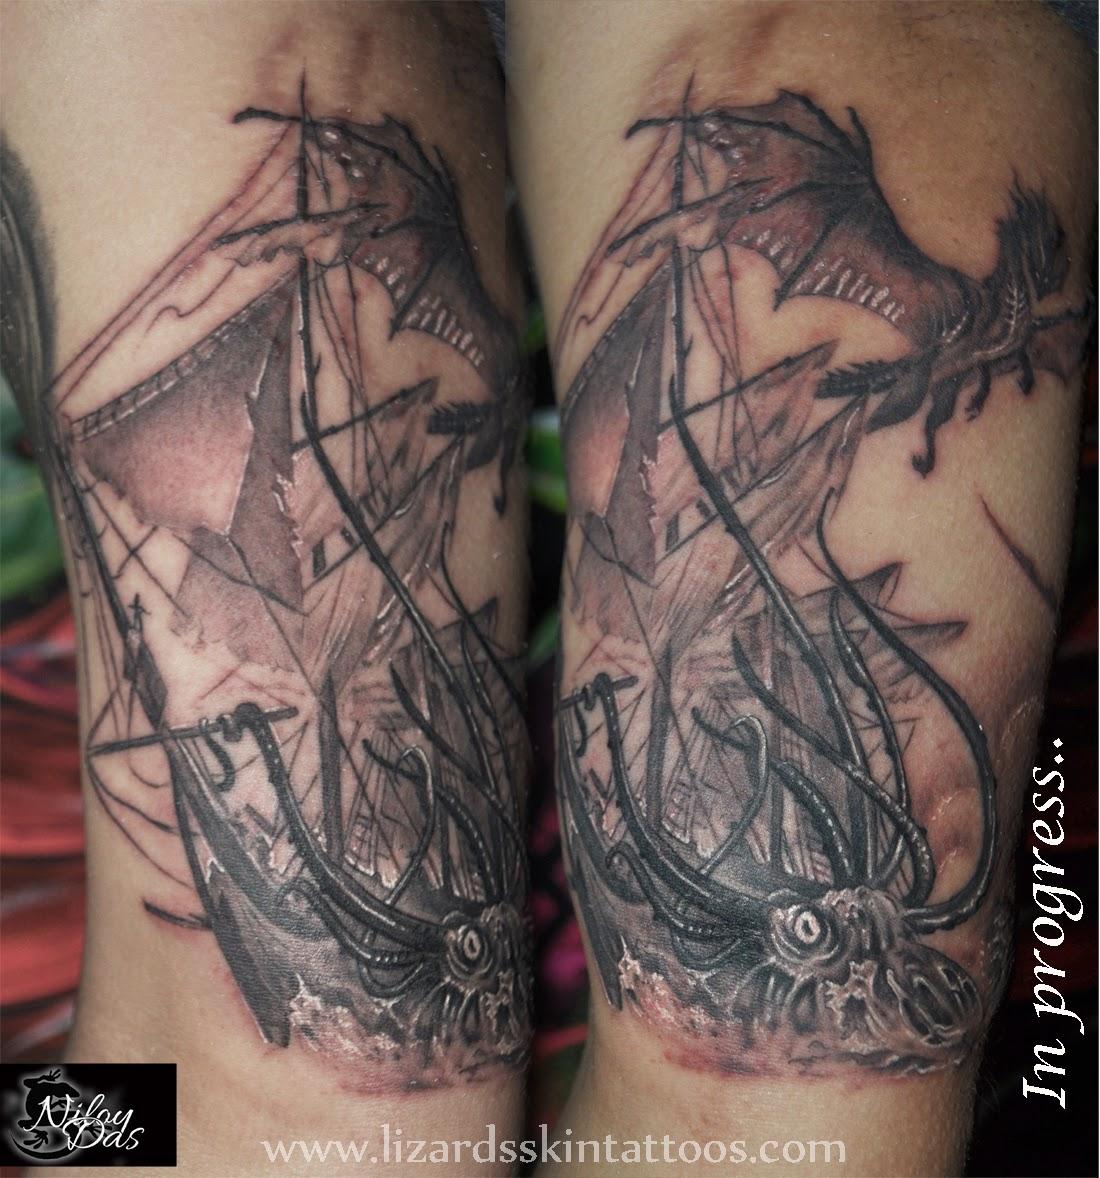 Lizard S Skin Tattoos Viking Half Sleeve In Progres By Niloy Das